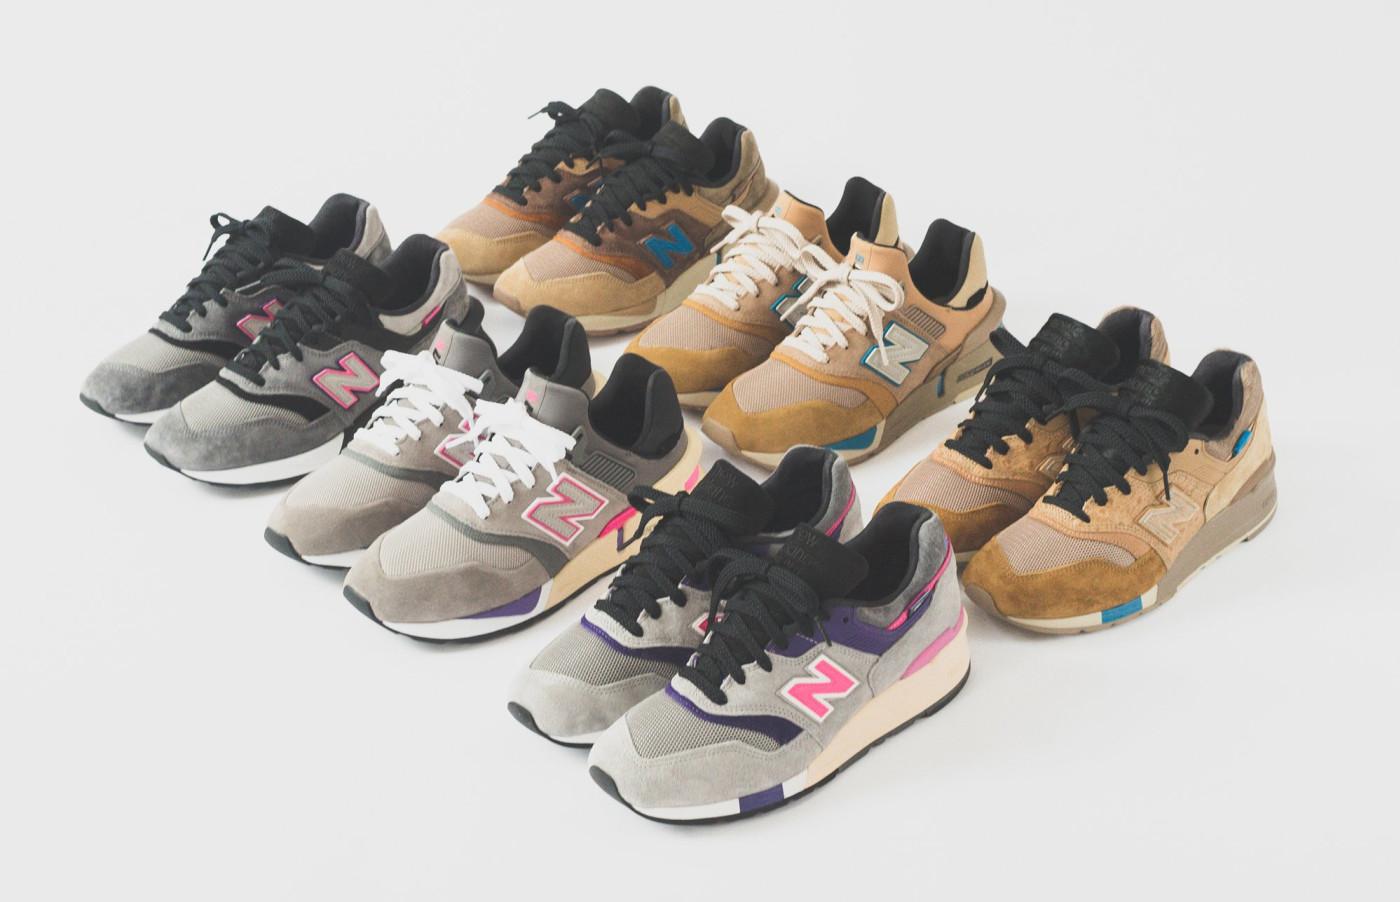 Kith x New Balance 2018 Collection